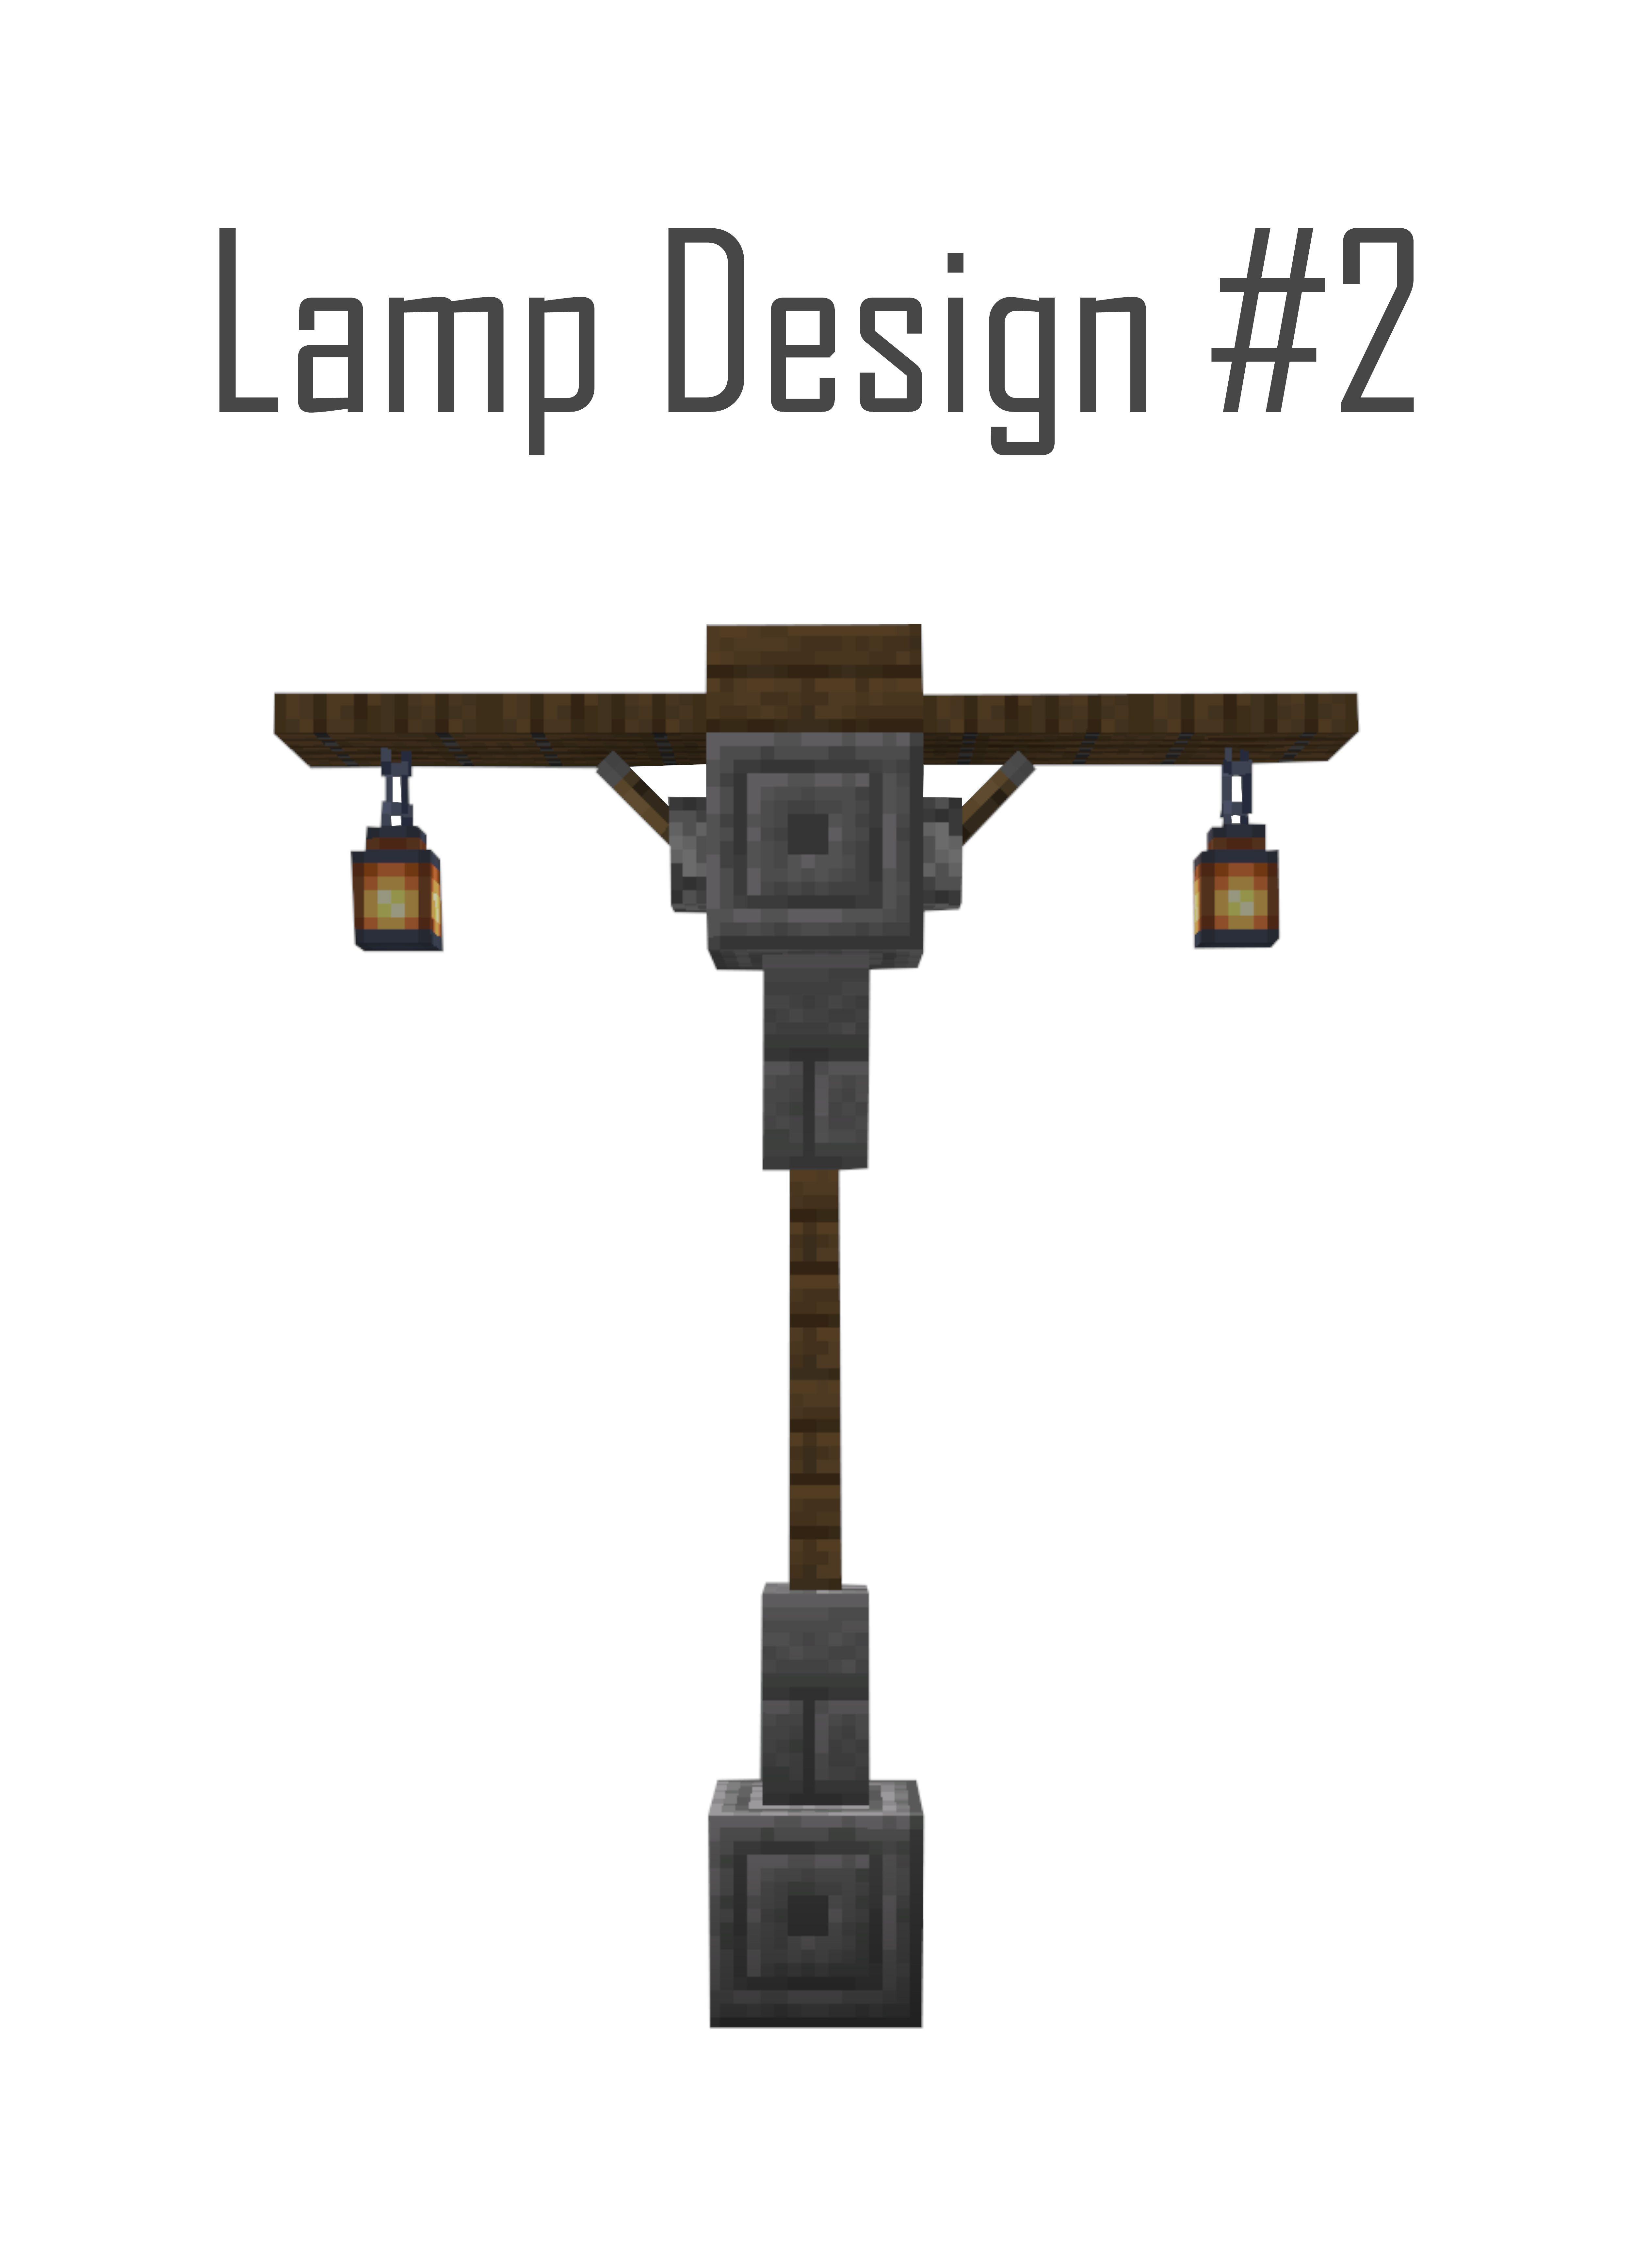 Minecraft Building Ideas Minecraftbuildingideas Medieval Street Lamp Design In 2020 Minecraft Building Minecraft Designs Minecraft